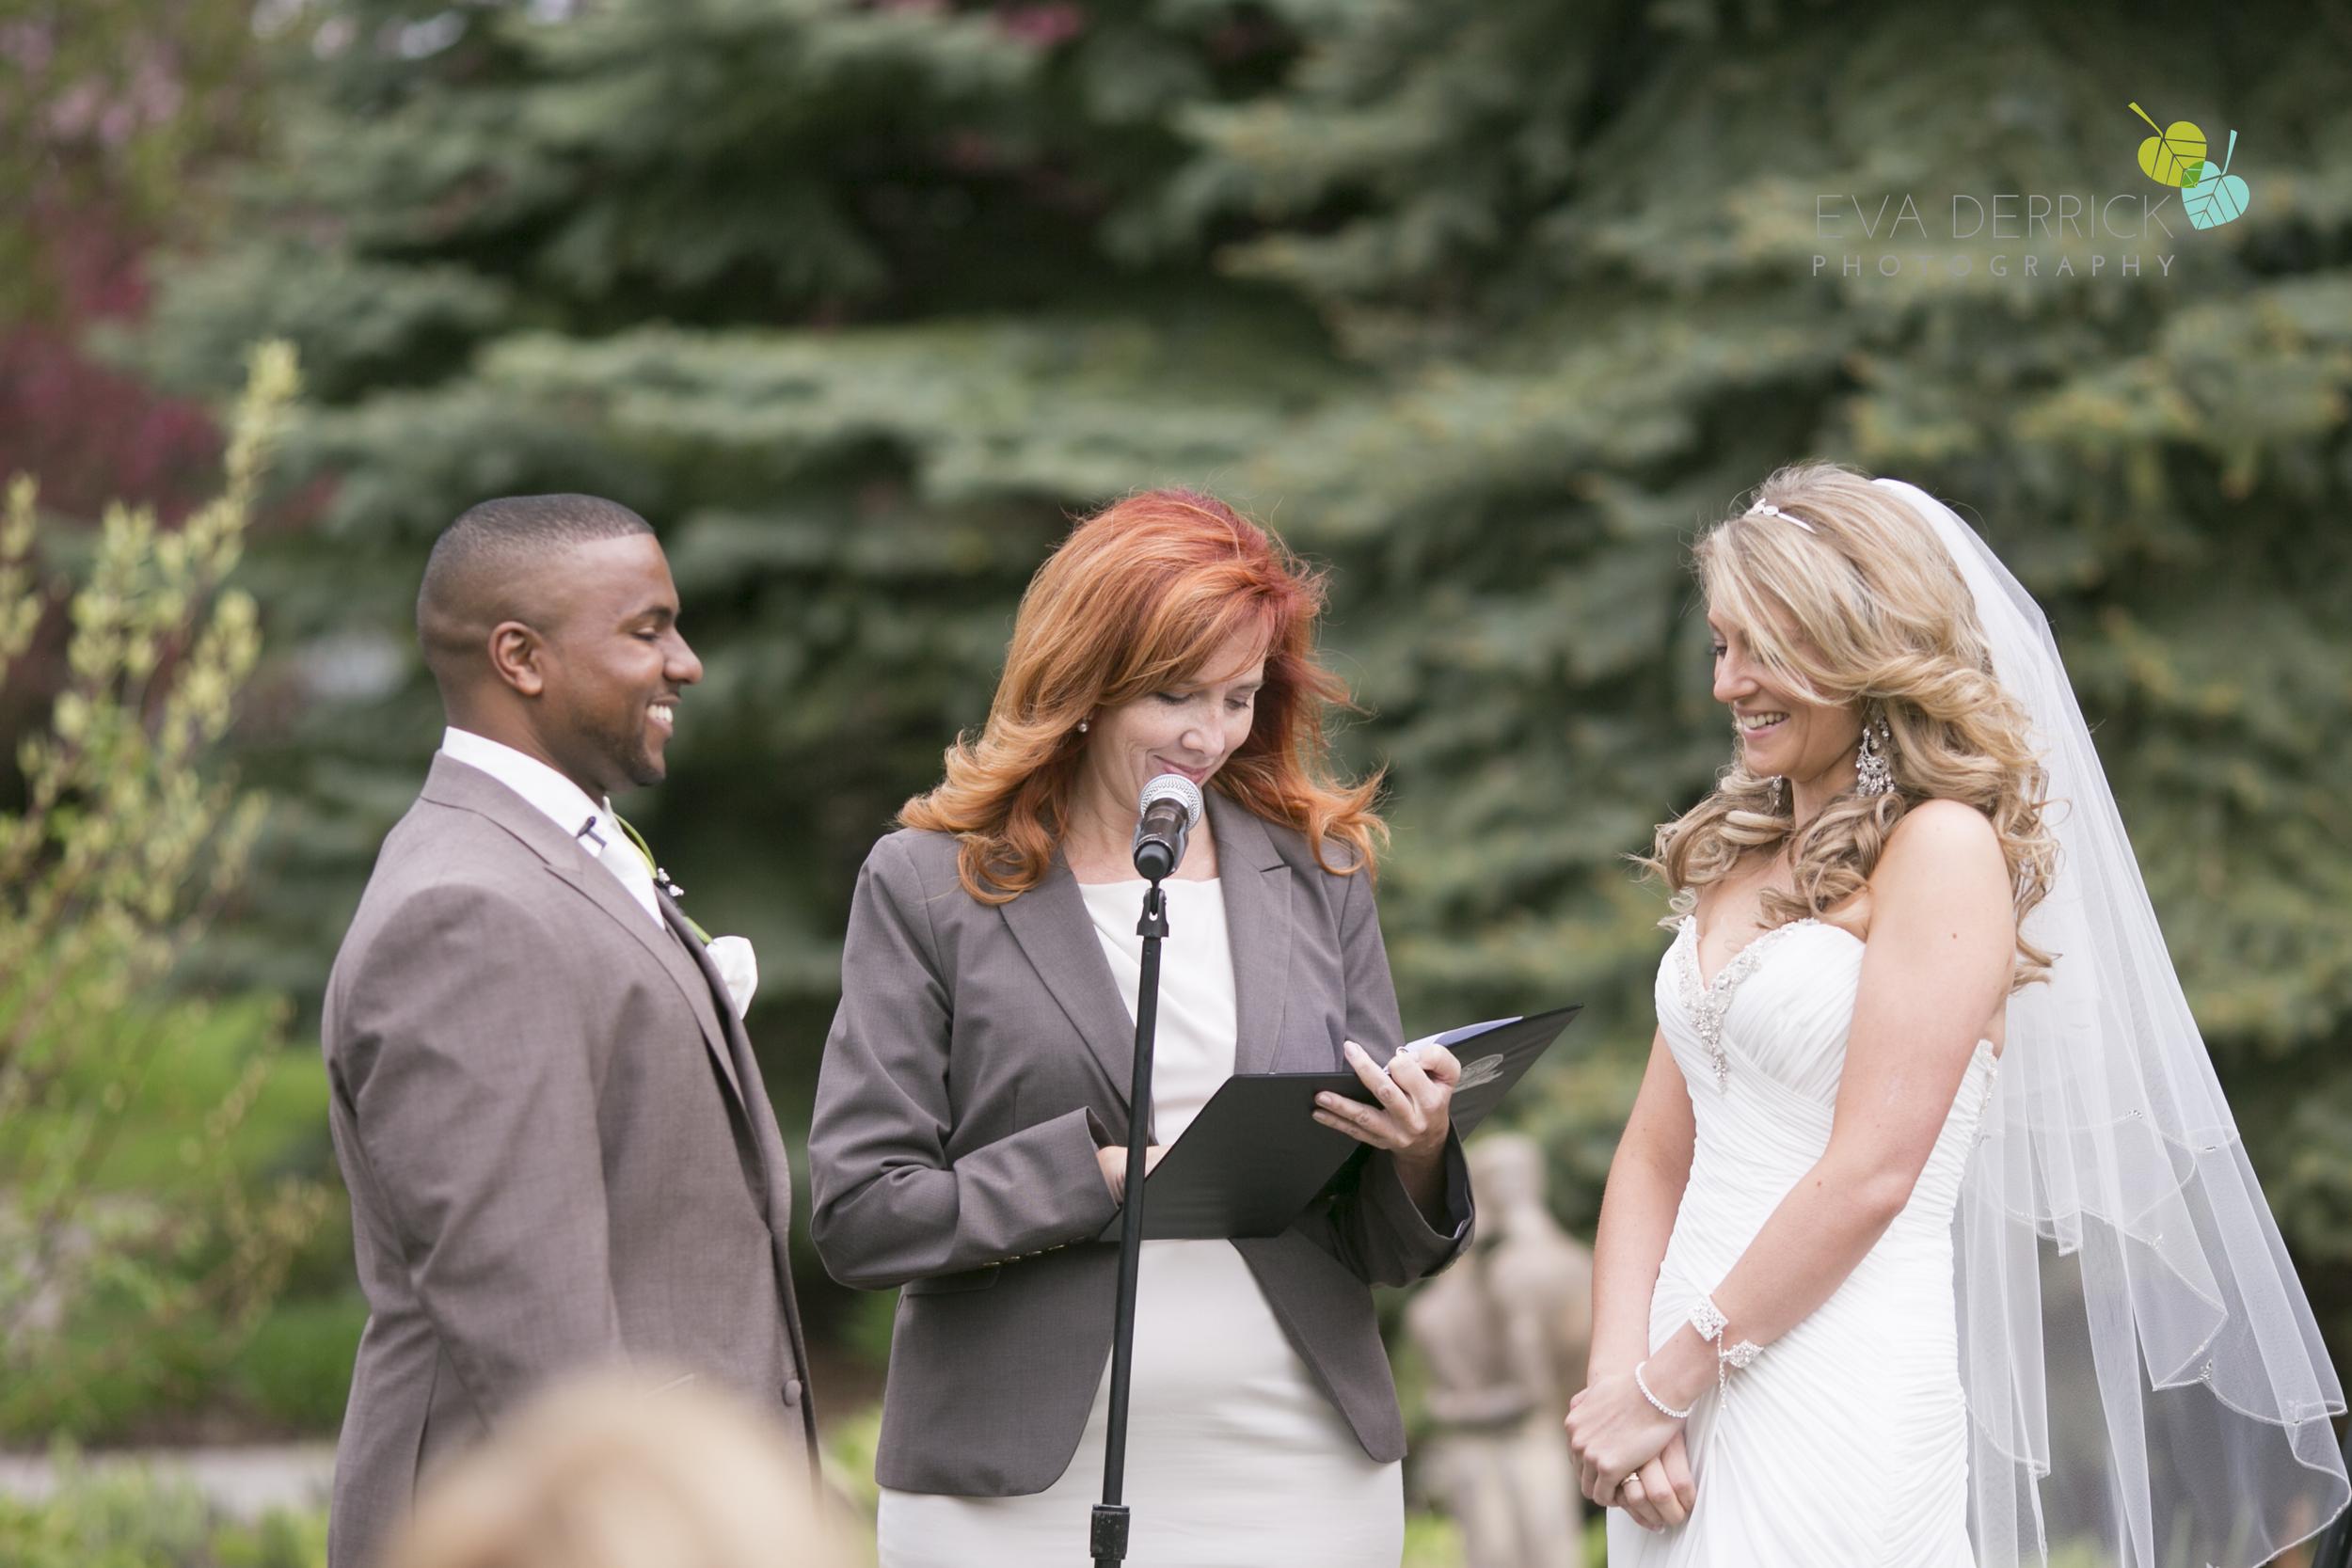 edp_wedding_jenna_chris-0089.jpg